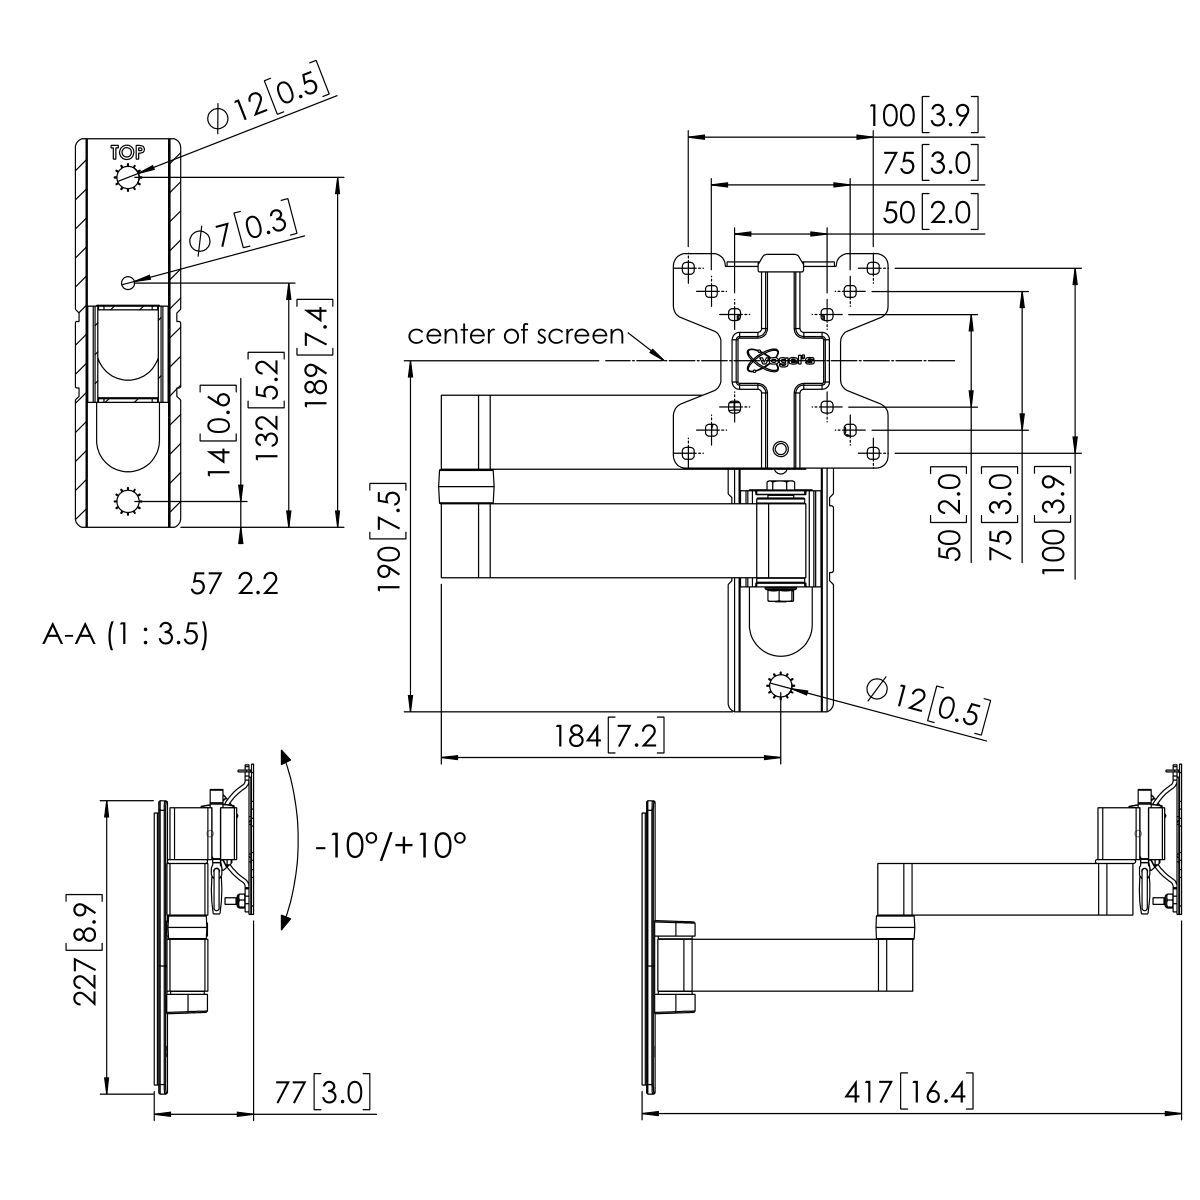 Vogel's PFW 1040 Uchwyt ścienny obrotowy - Dimensions